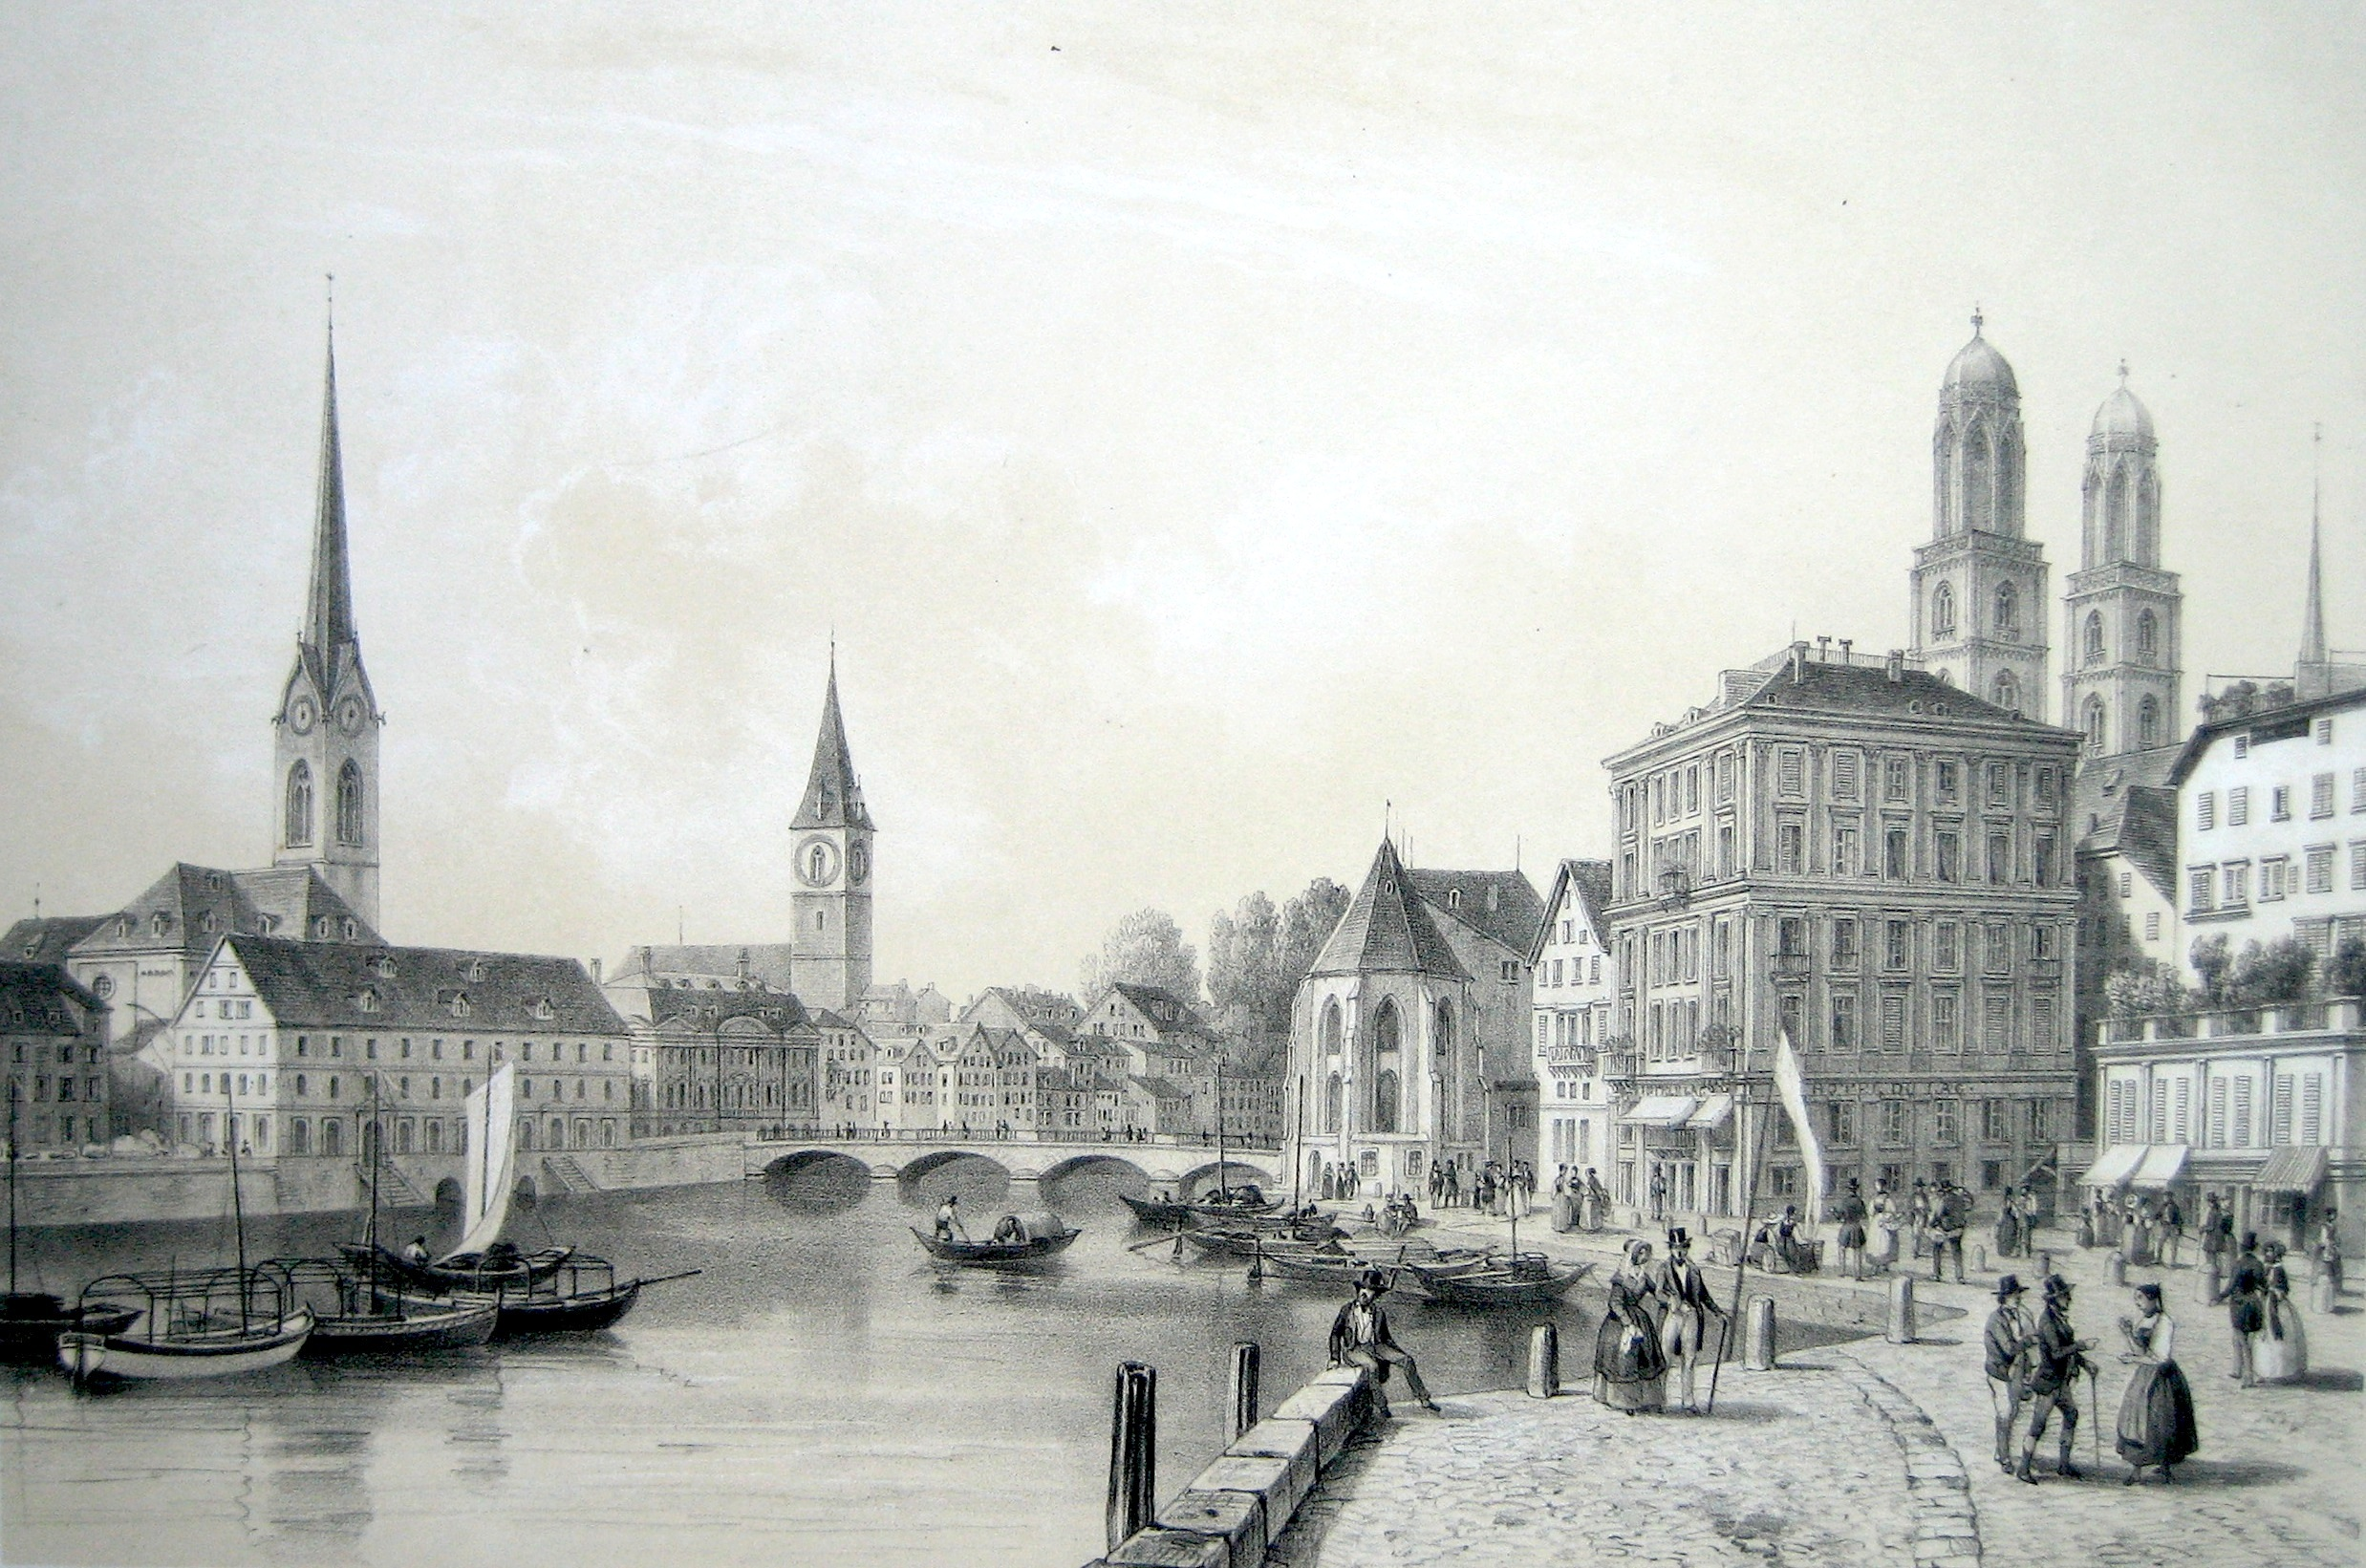 File:Sonnenquai 1845.jpg